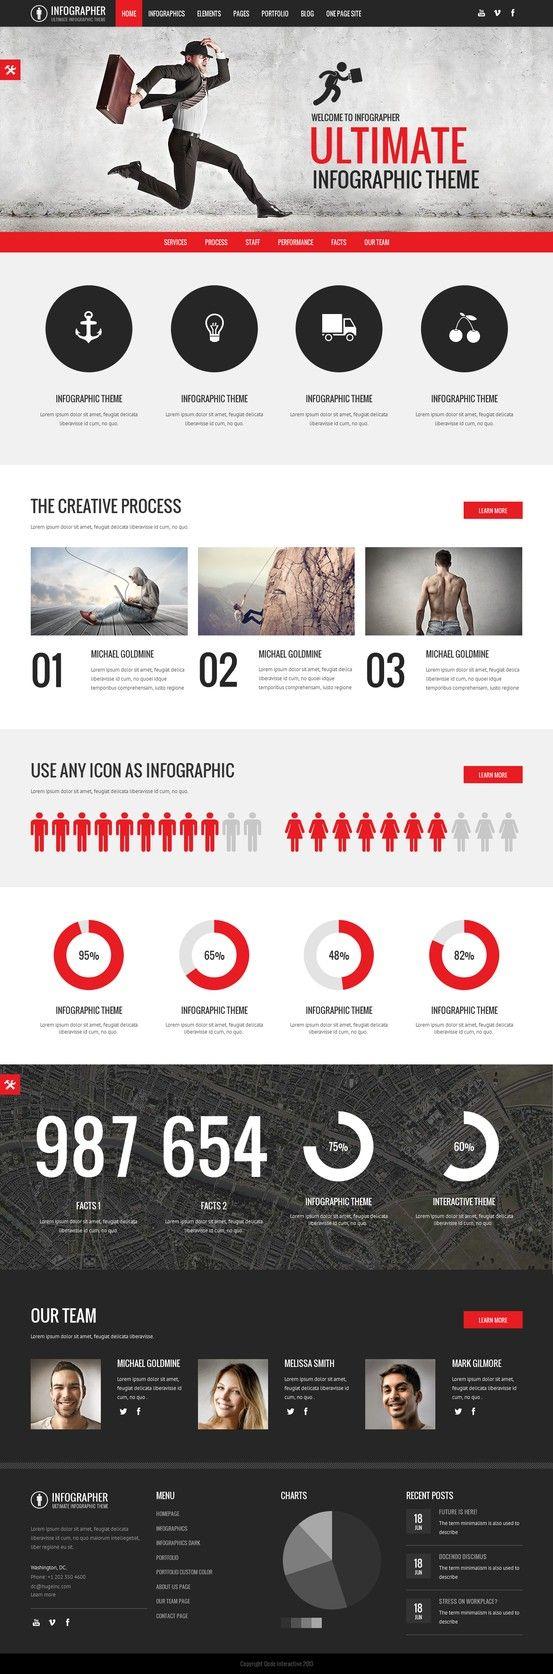 Infographer - Multi-Purpose Infographic Theme http://themeforest.net/item/infographer-multipurpose-infographic-theme/5027304?ref=wpaw #web #design #wordpress